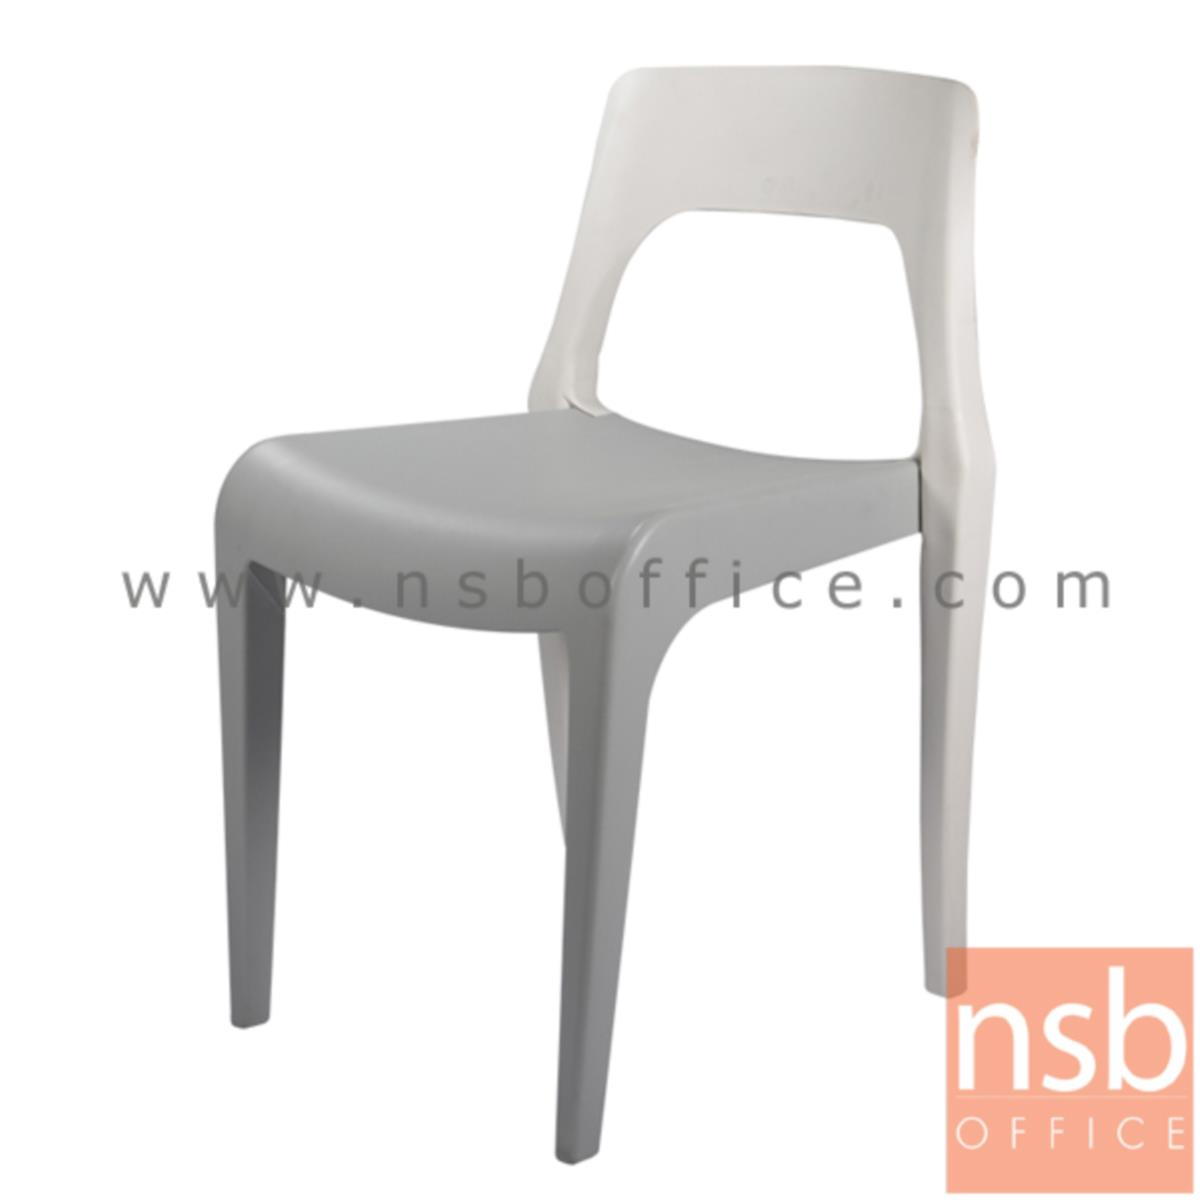 B11A029:เก้าอี้โมเดิร์นพลาสติกล้วน(PP)สีสันทูโทน รุ่น PTN-PN9132 ขนาด 48W cm.